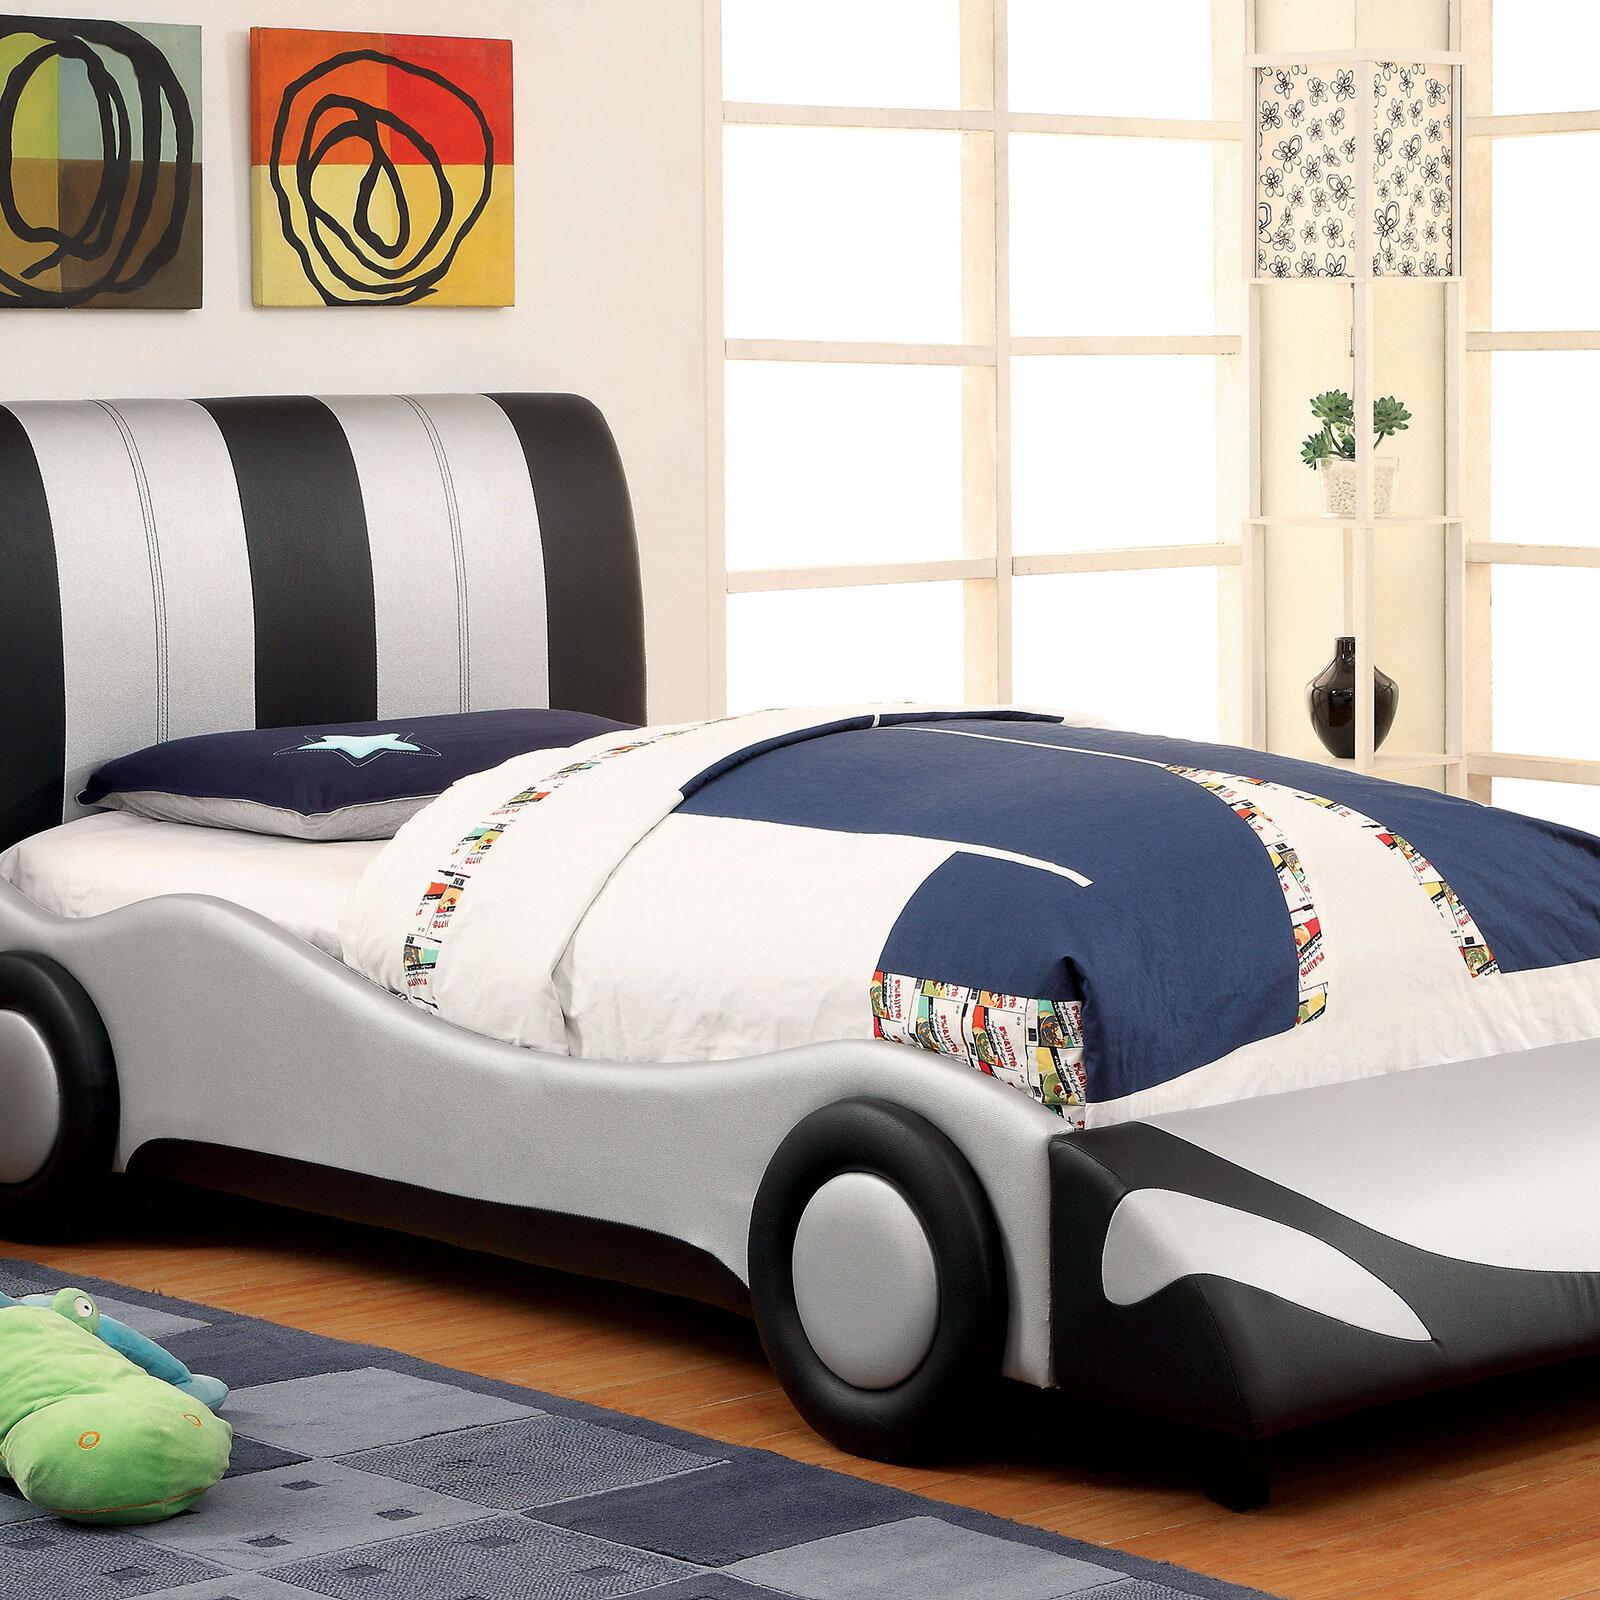 CHILDREN KIDS BED CAR FREE MATTRESS TODDLER BOYS GIRLS 140x70 160x80 180x80 140x70, 8